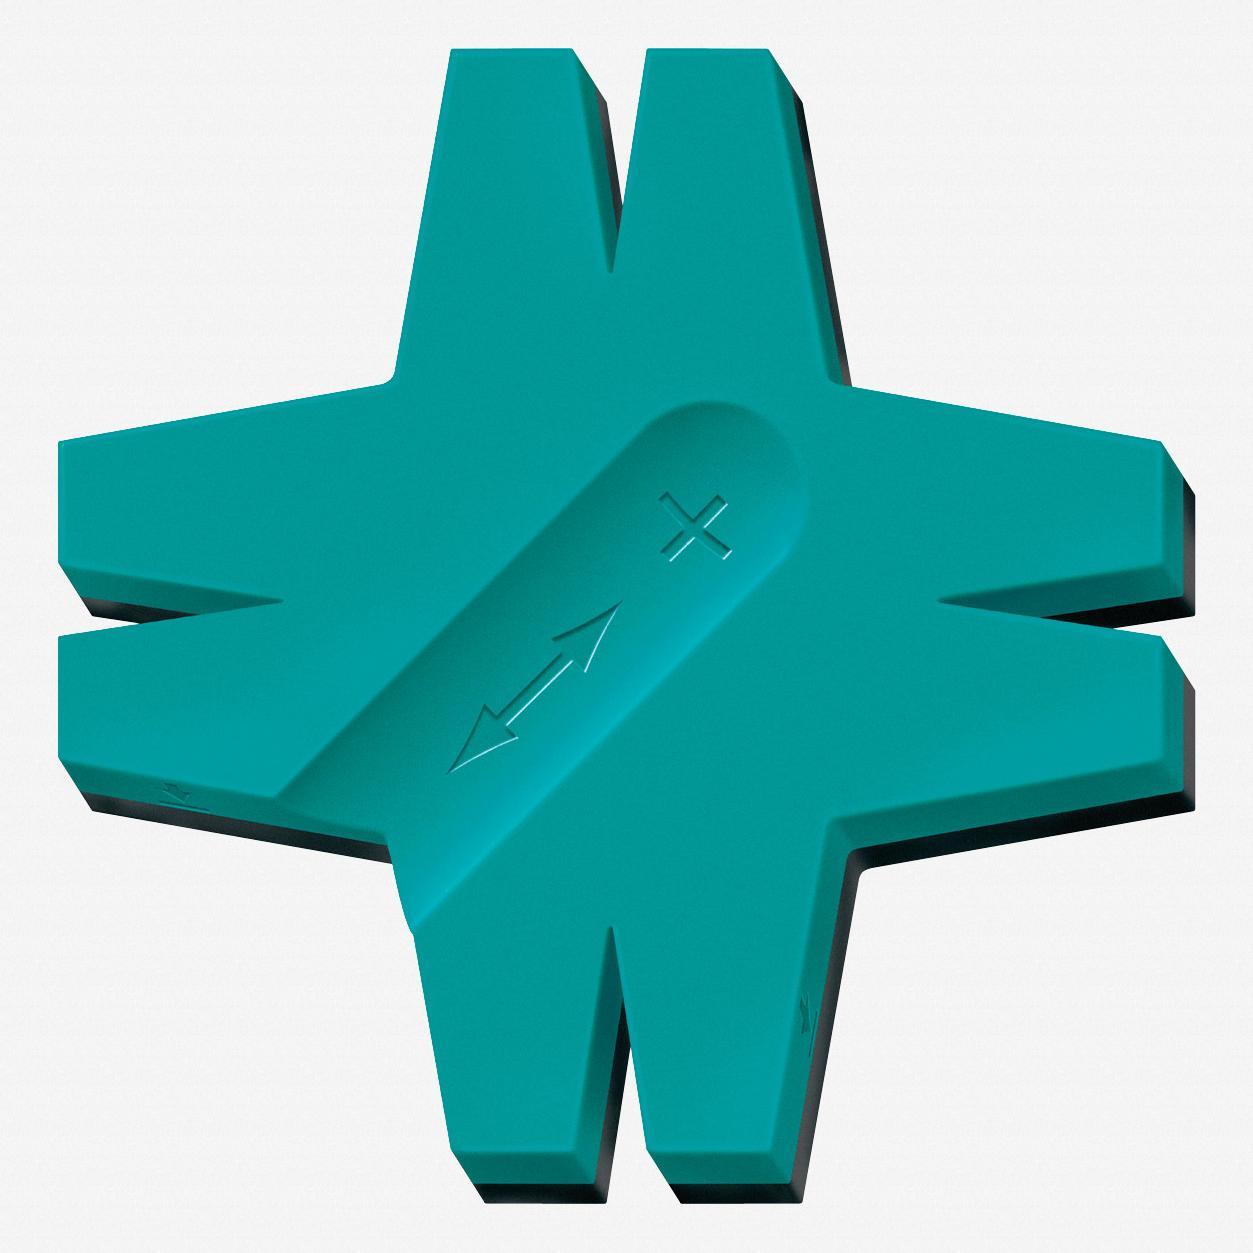 Wera 073403 Star - Magnetizer / Demagnetizer - KC Tool